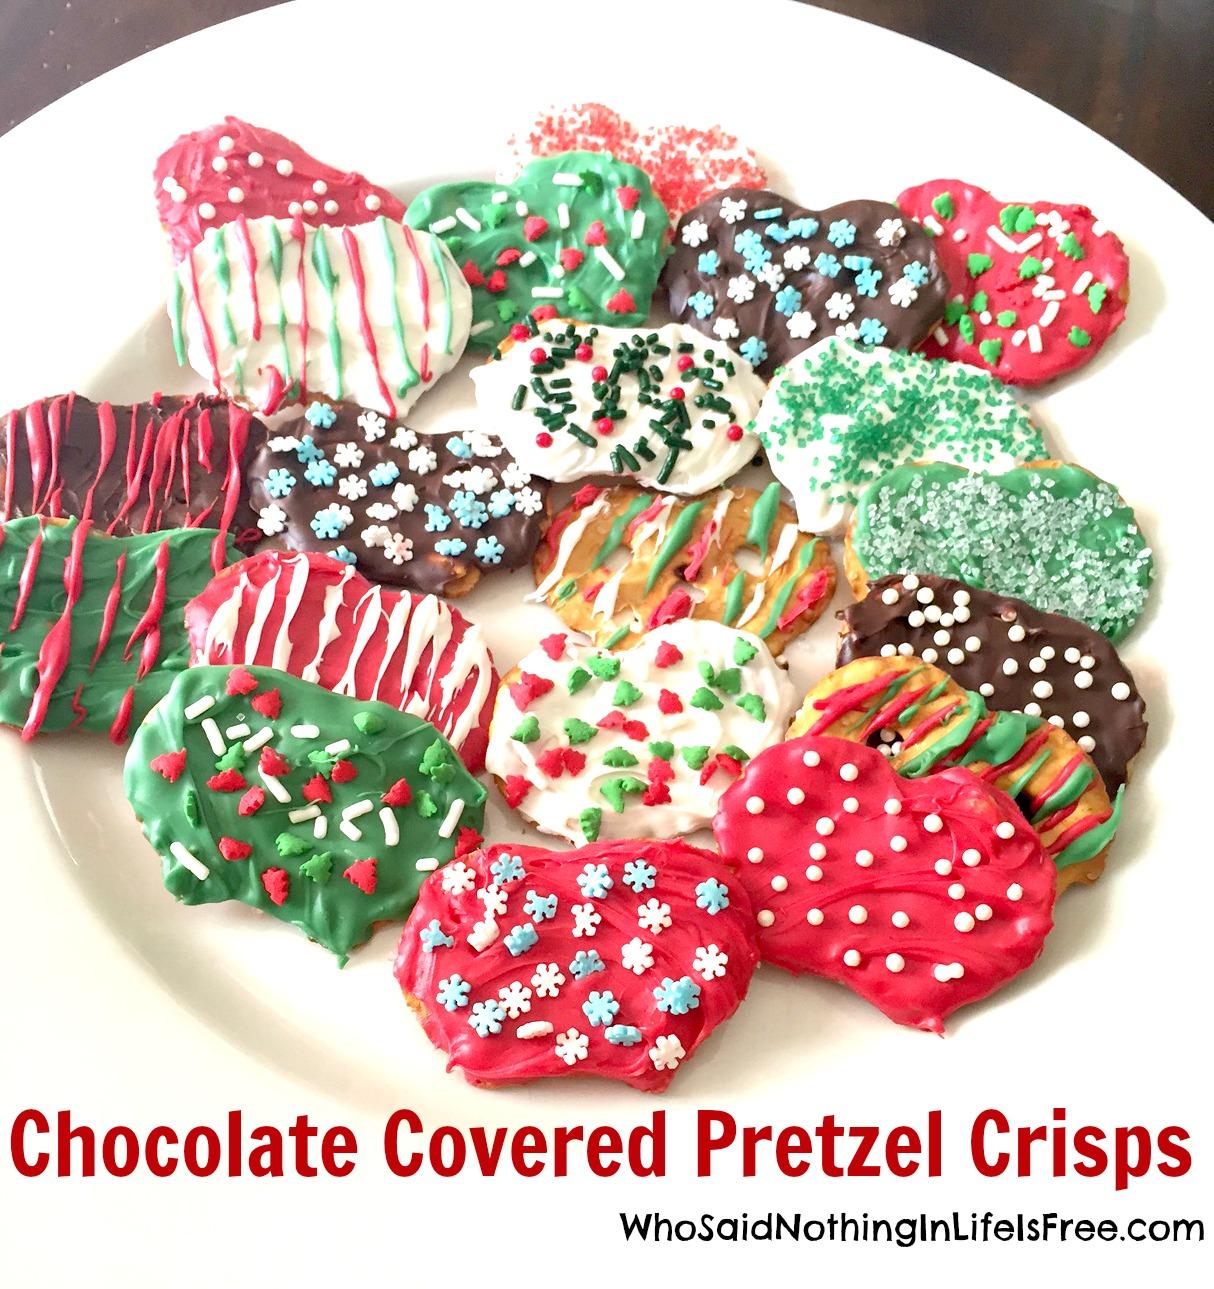 holiday pretzel crisps - Christmas Chocolate Covered Pretzels